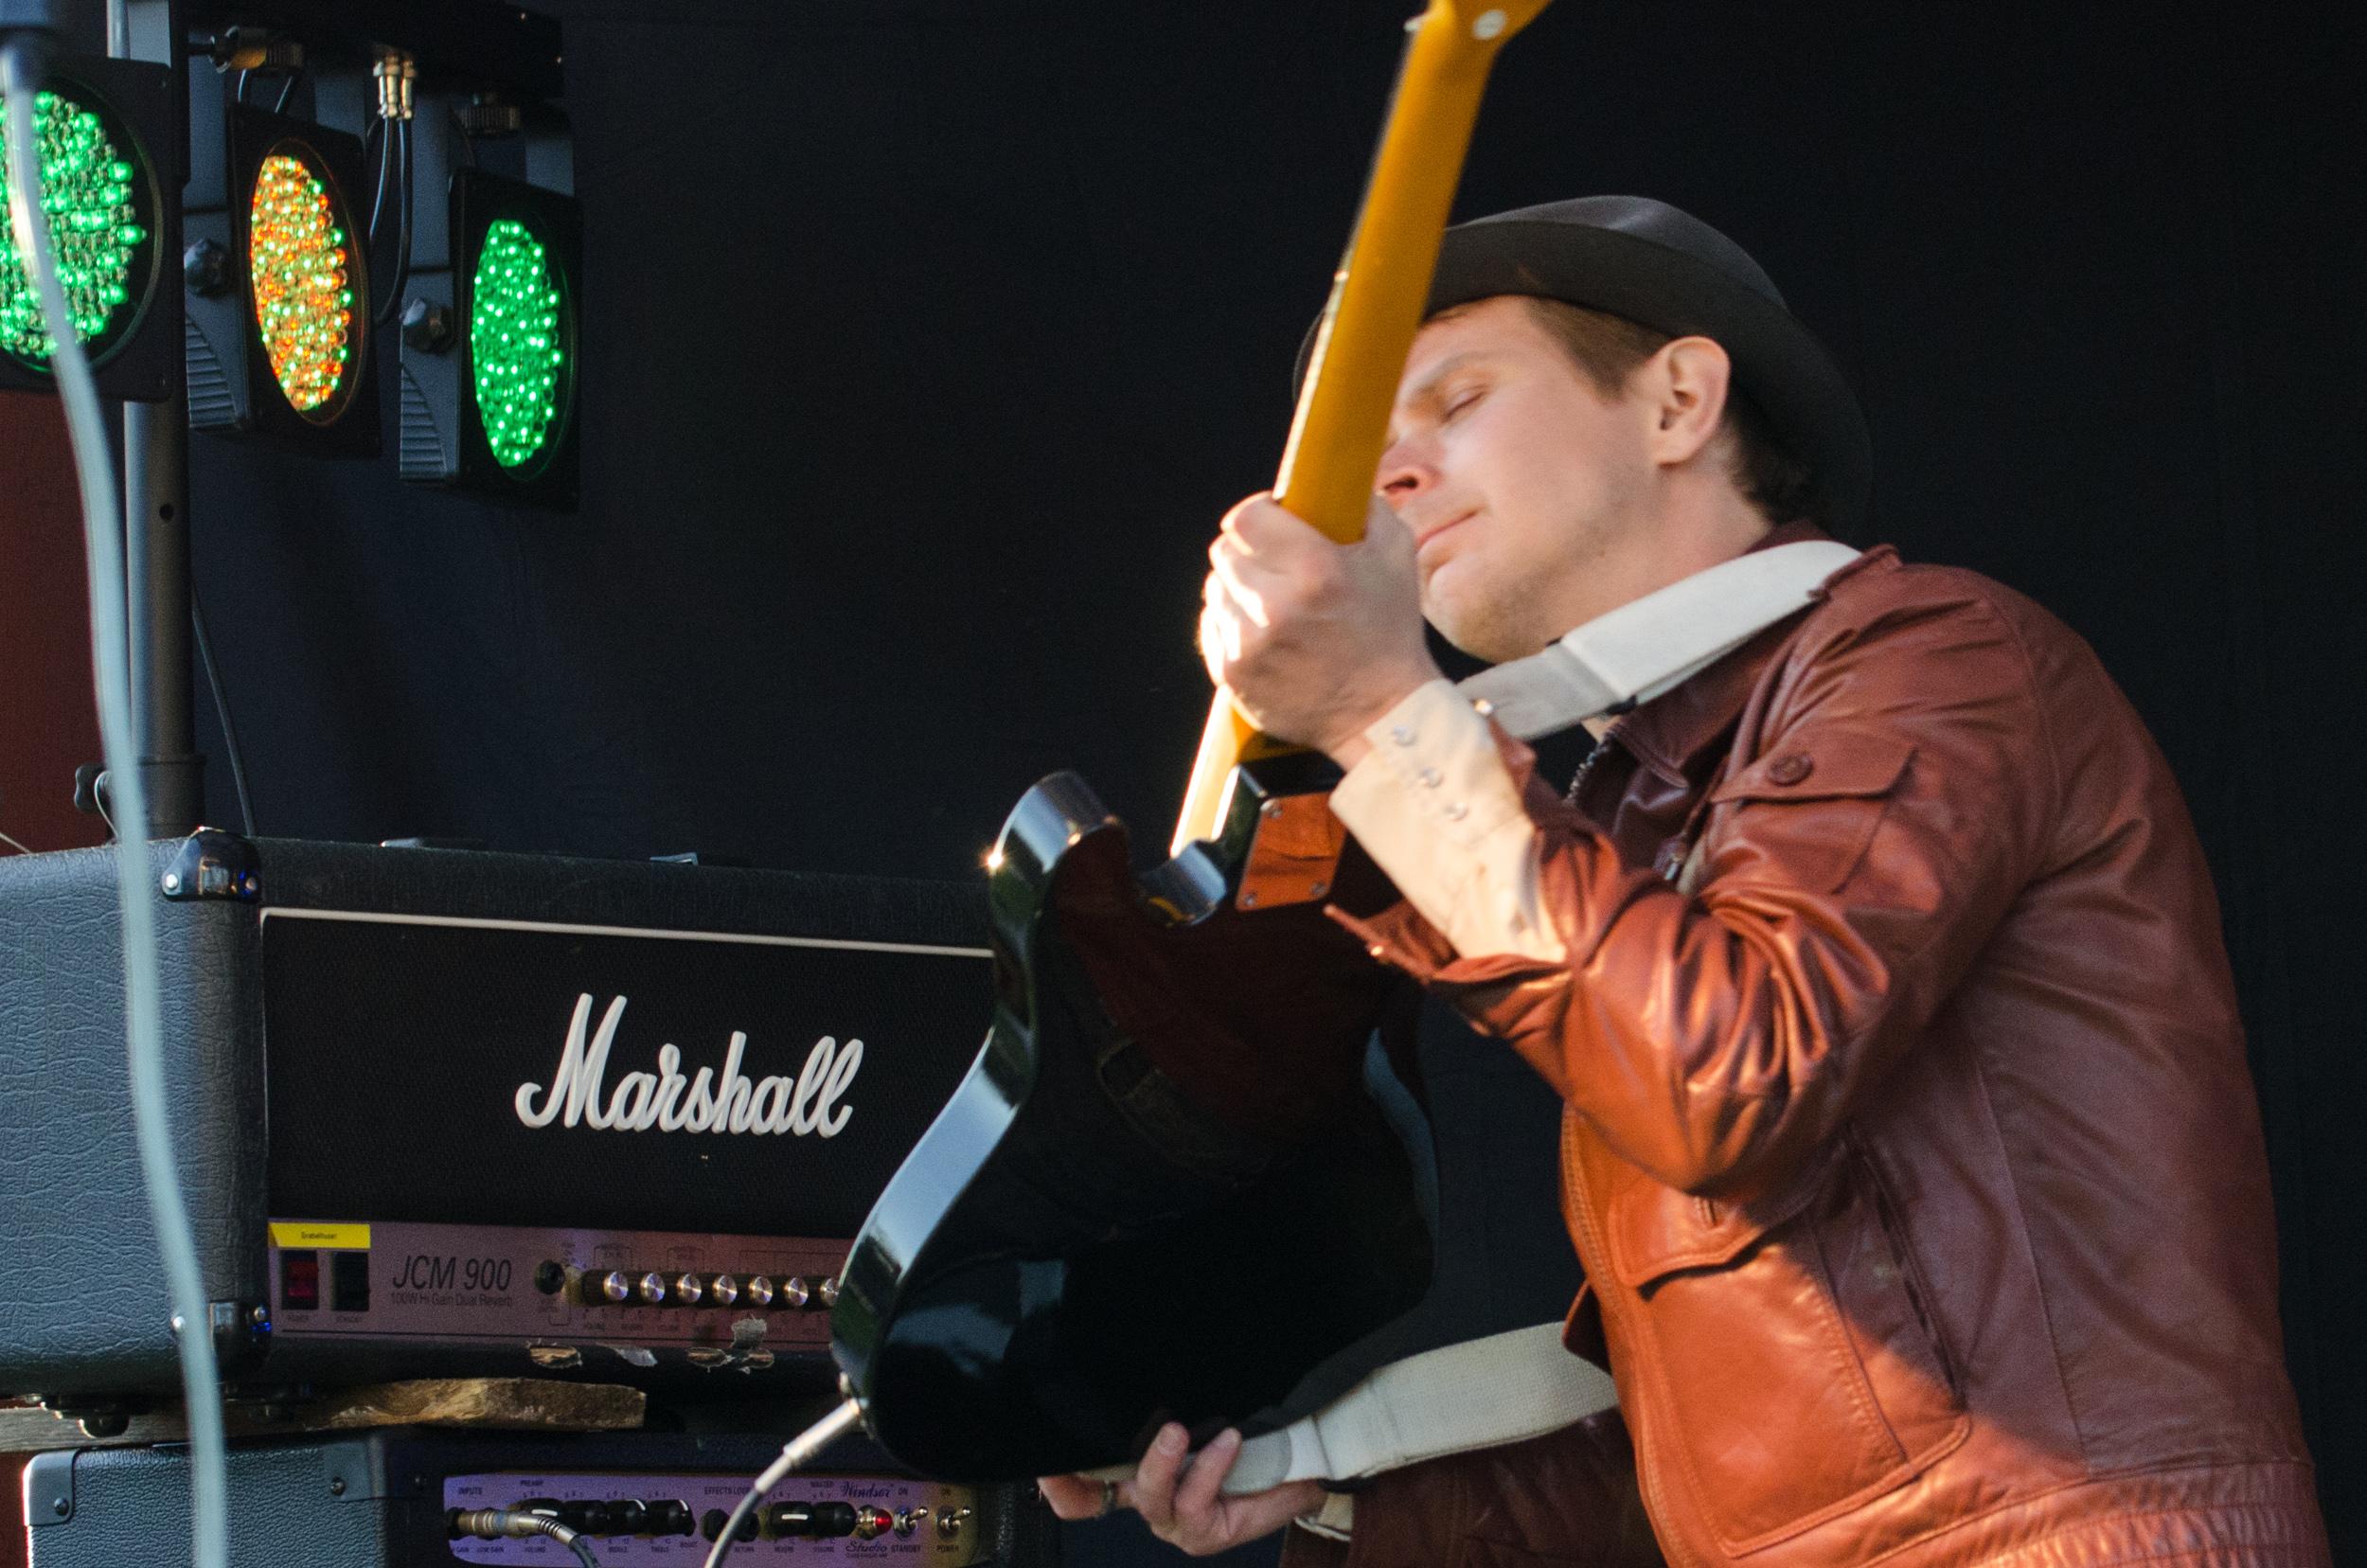 Cocodrilo Cuervo på Kläppenfestivalen i Boden